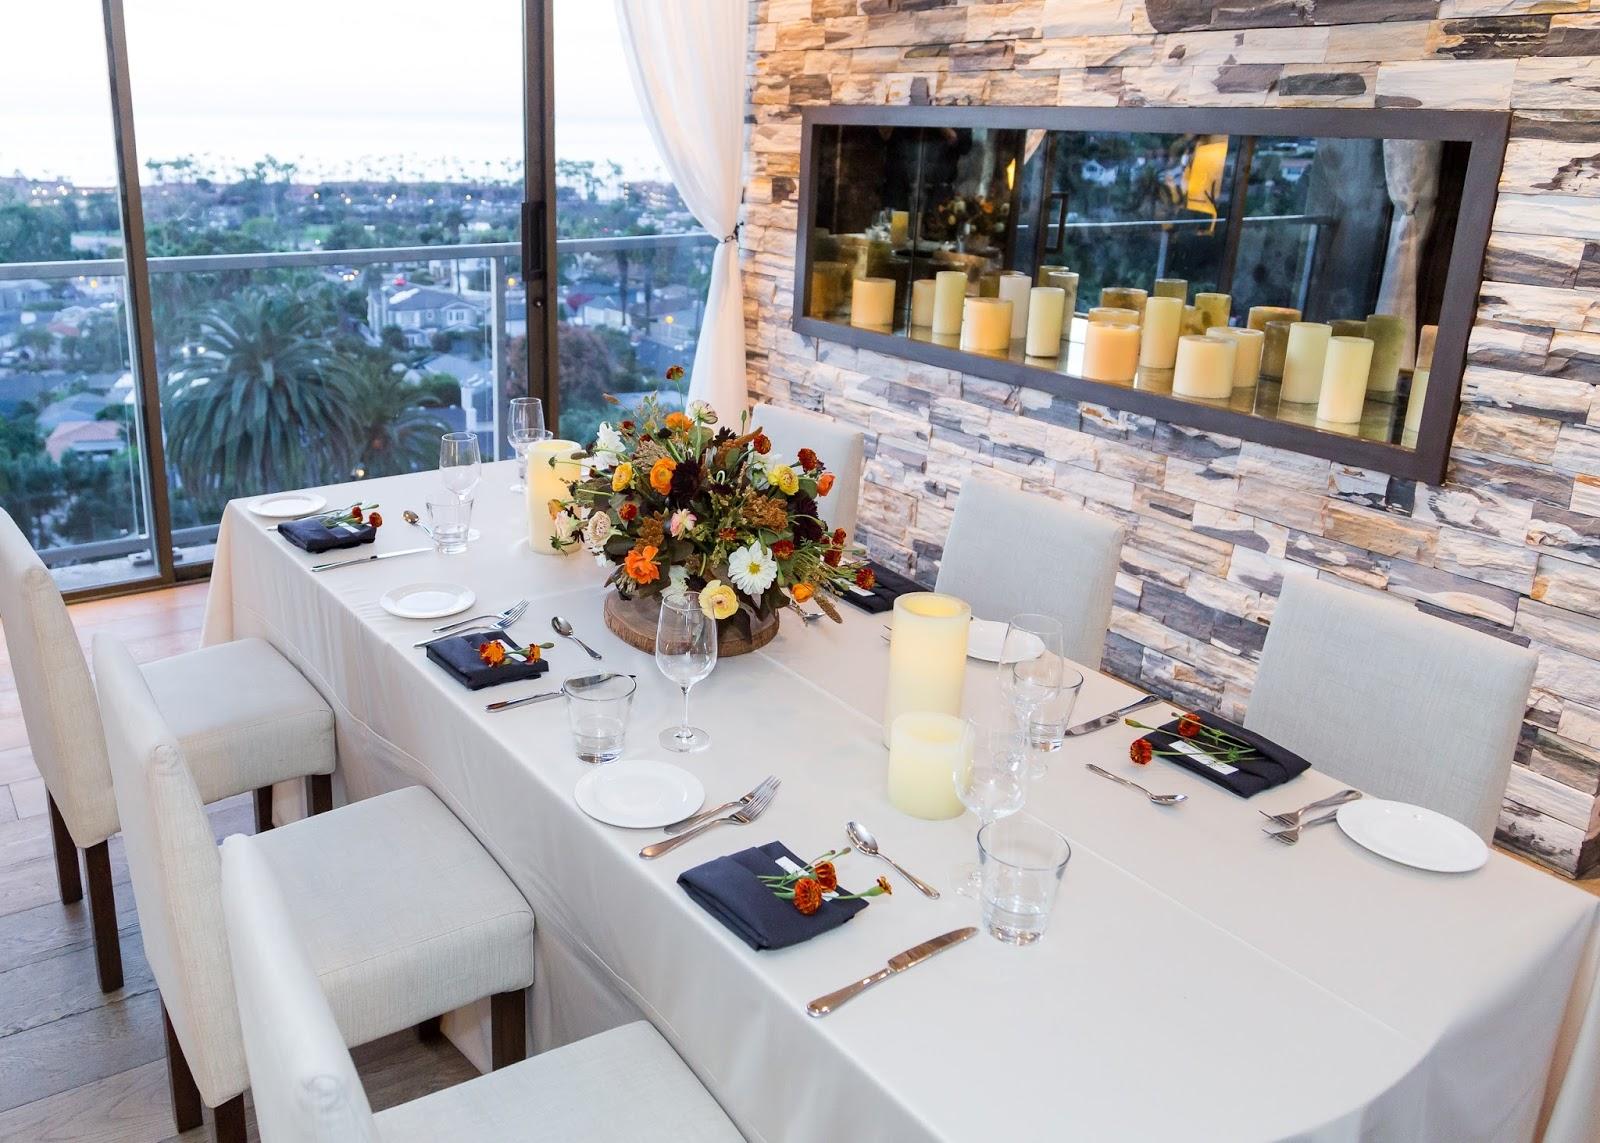 CUSP Hotel La Jolla, CUSP dining experience, CUSP San Diego, Madmade design floral arrangement, fall floral arrangement